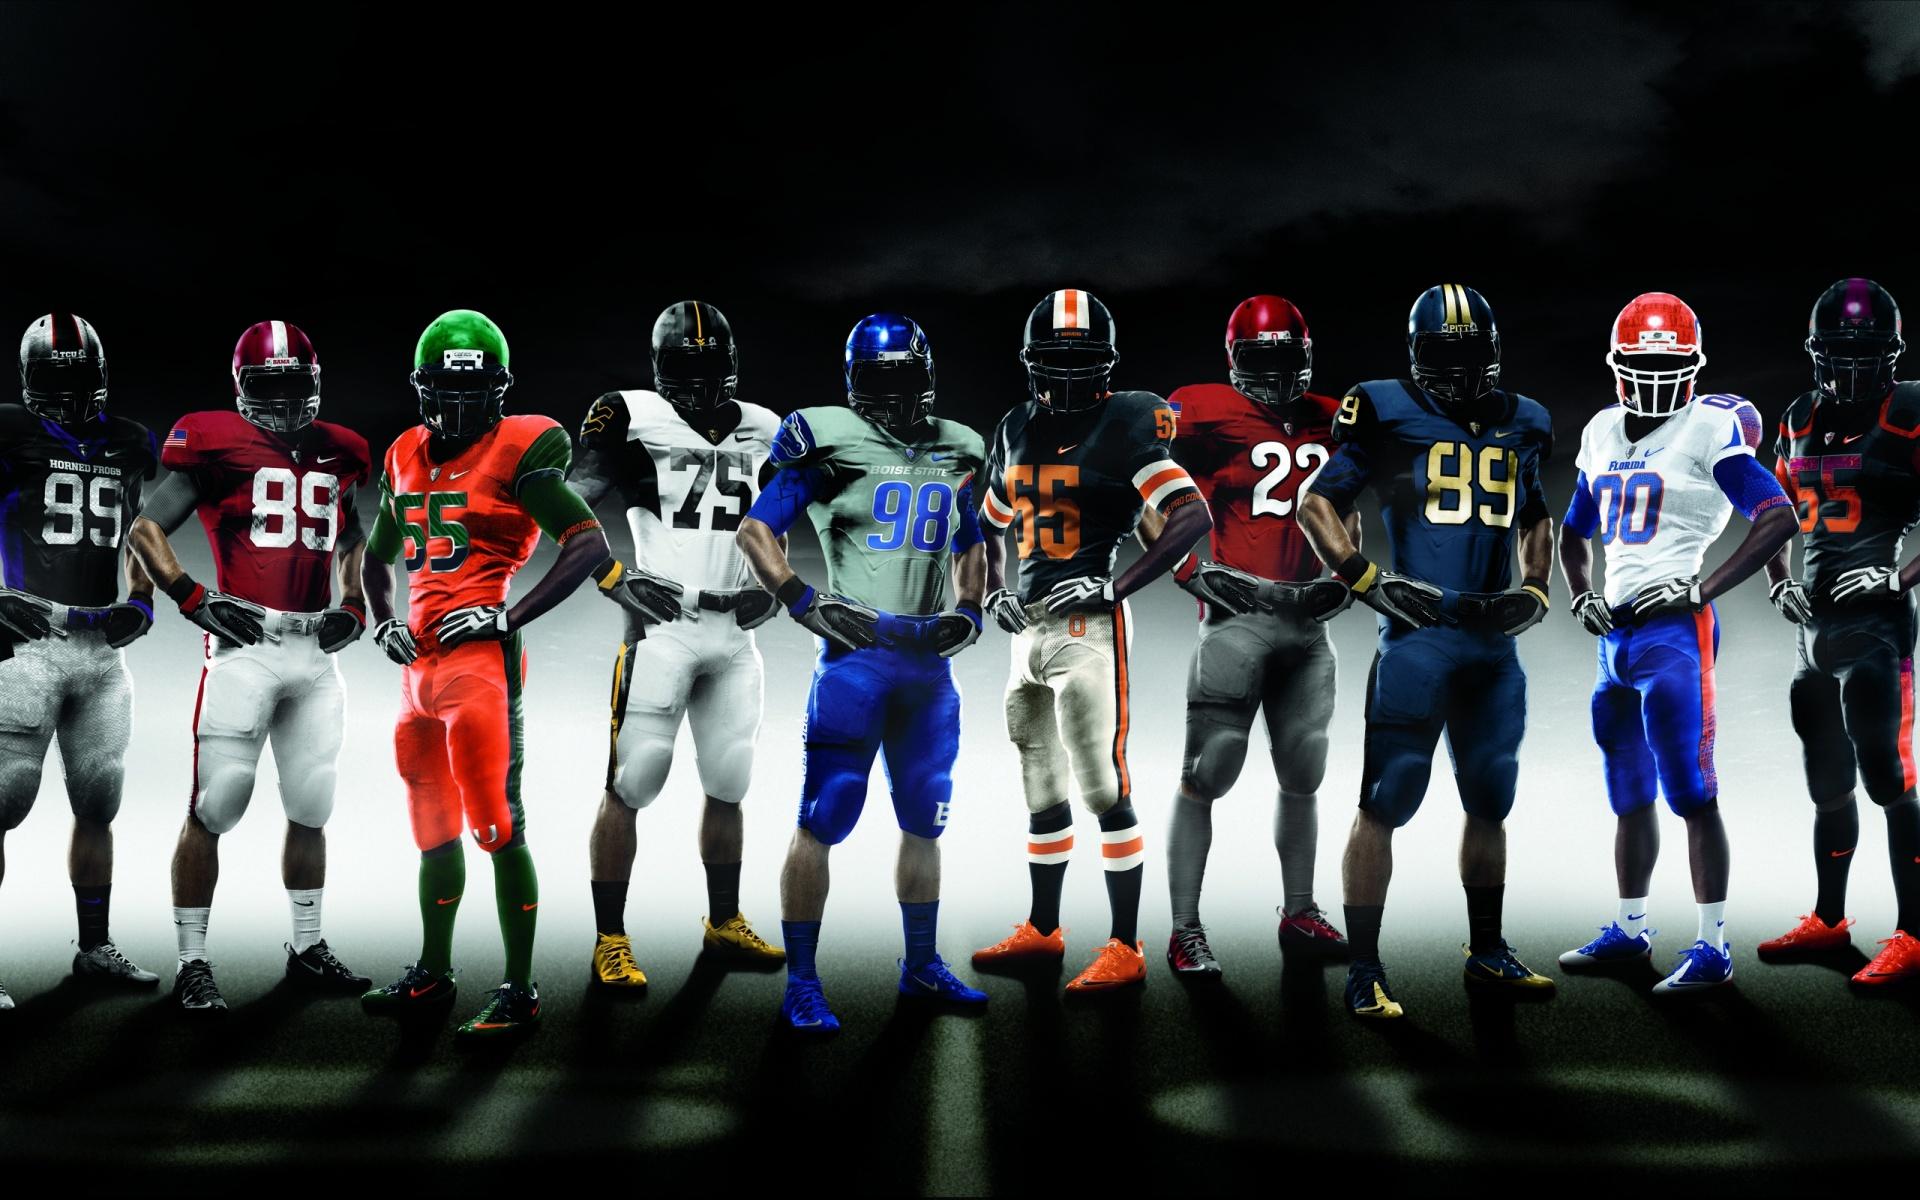 Nike Football Wallpaper HD Resolution 1920x1200